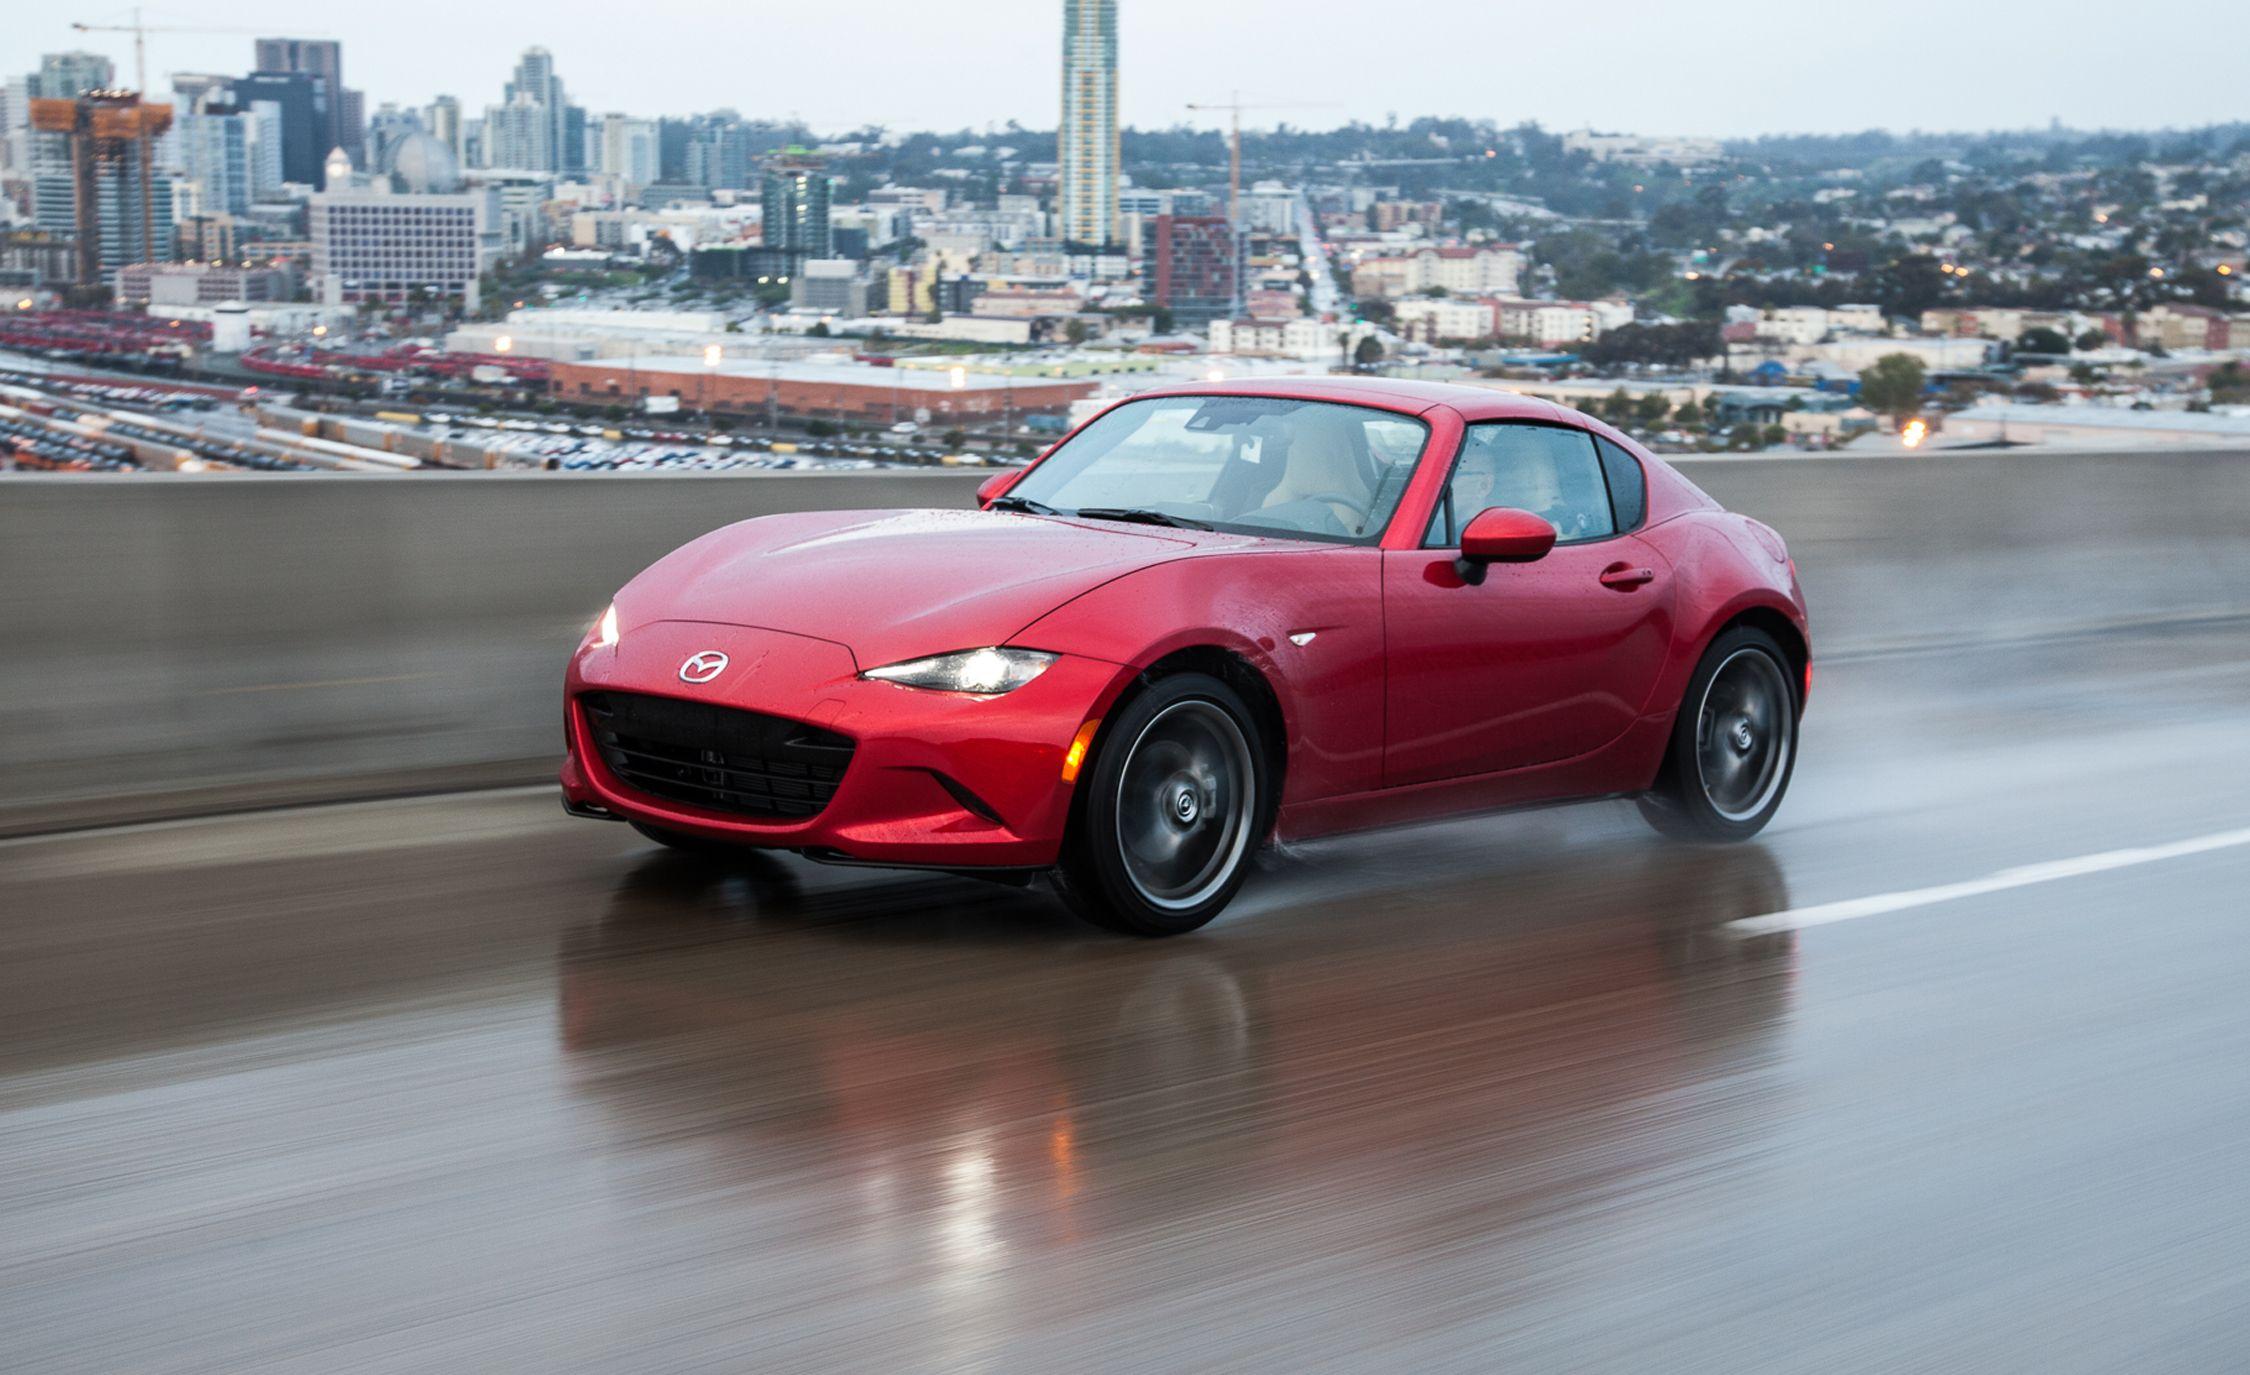 Mazda Mx 5 Rf >> 2017 Mazda Mx 5 Miata Rf First Drive Review Car And Driver